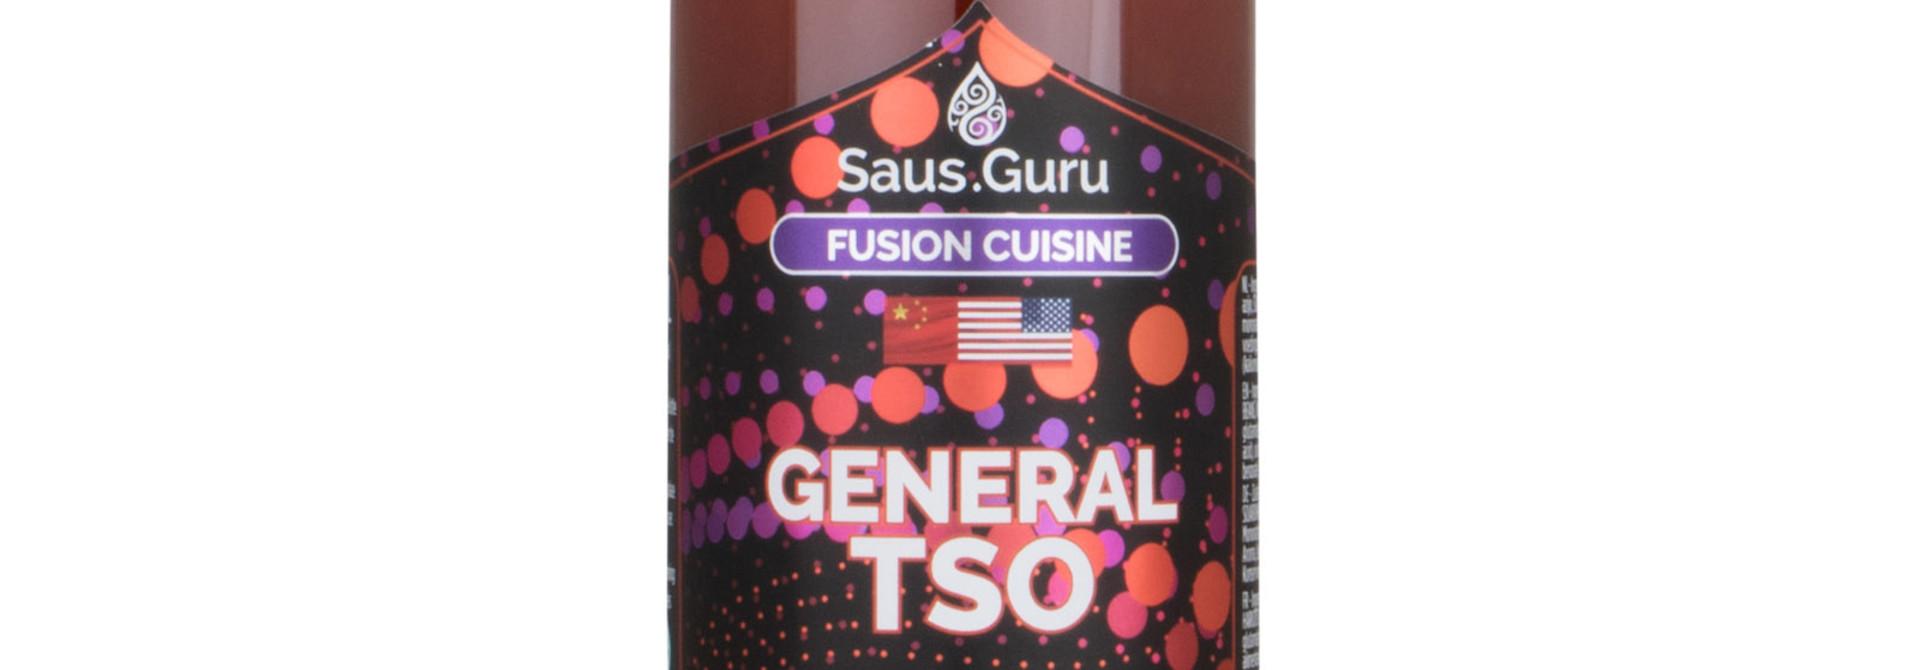 Saus.Guru's General TSO